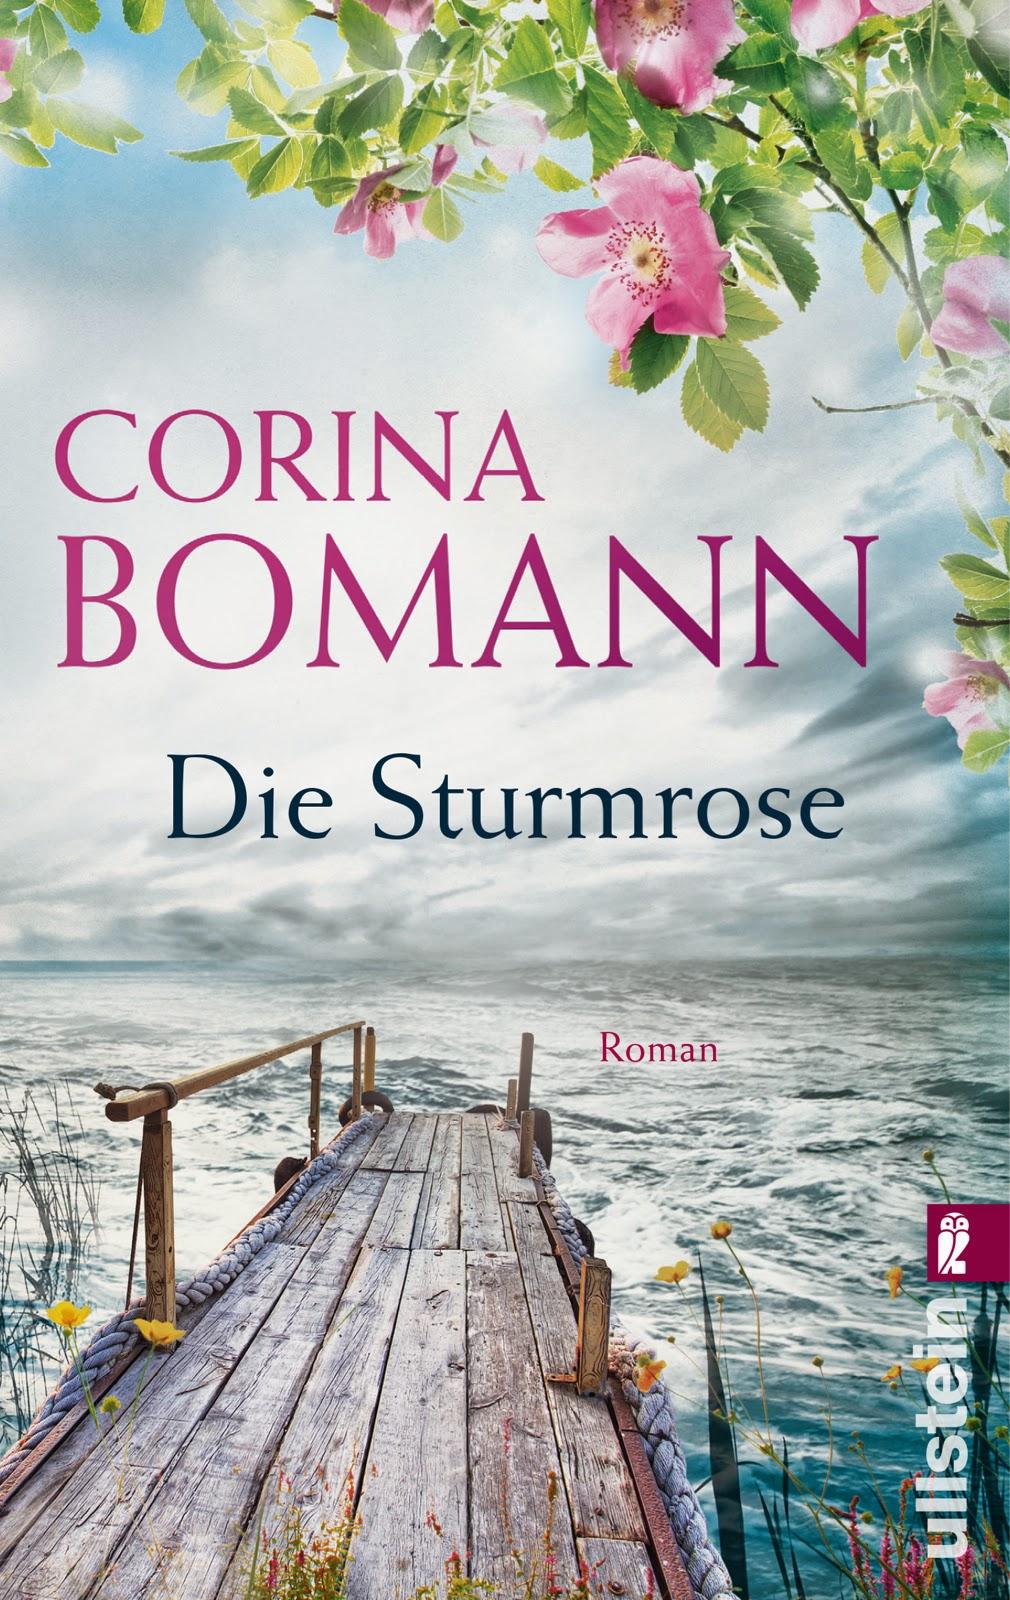 http://www.ullsteinbuchverlage.de/nc/buch/details/die-sturmrose-9783548286686.html?cHash=9c7c77096b46ee40220af9462d8cf71e